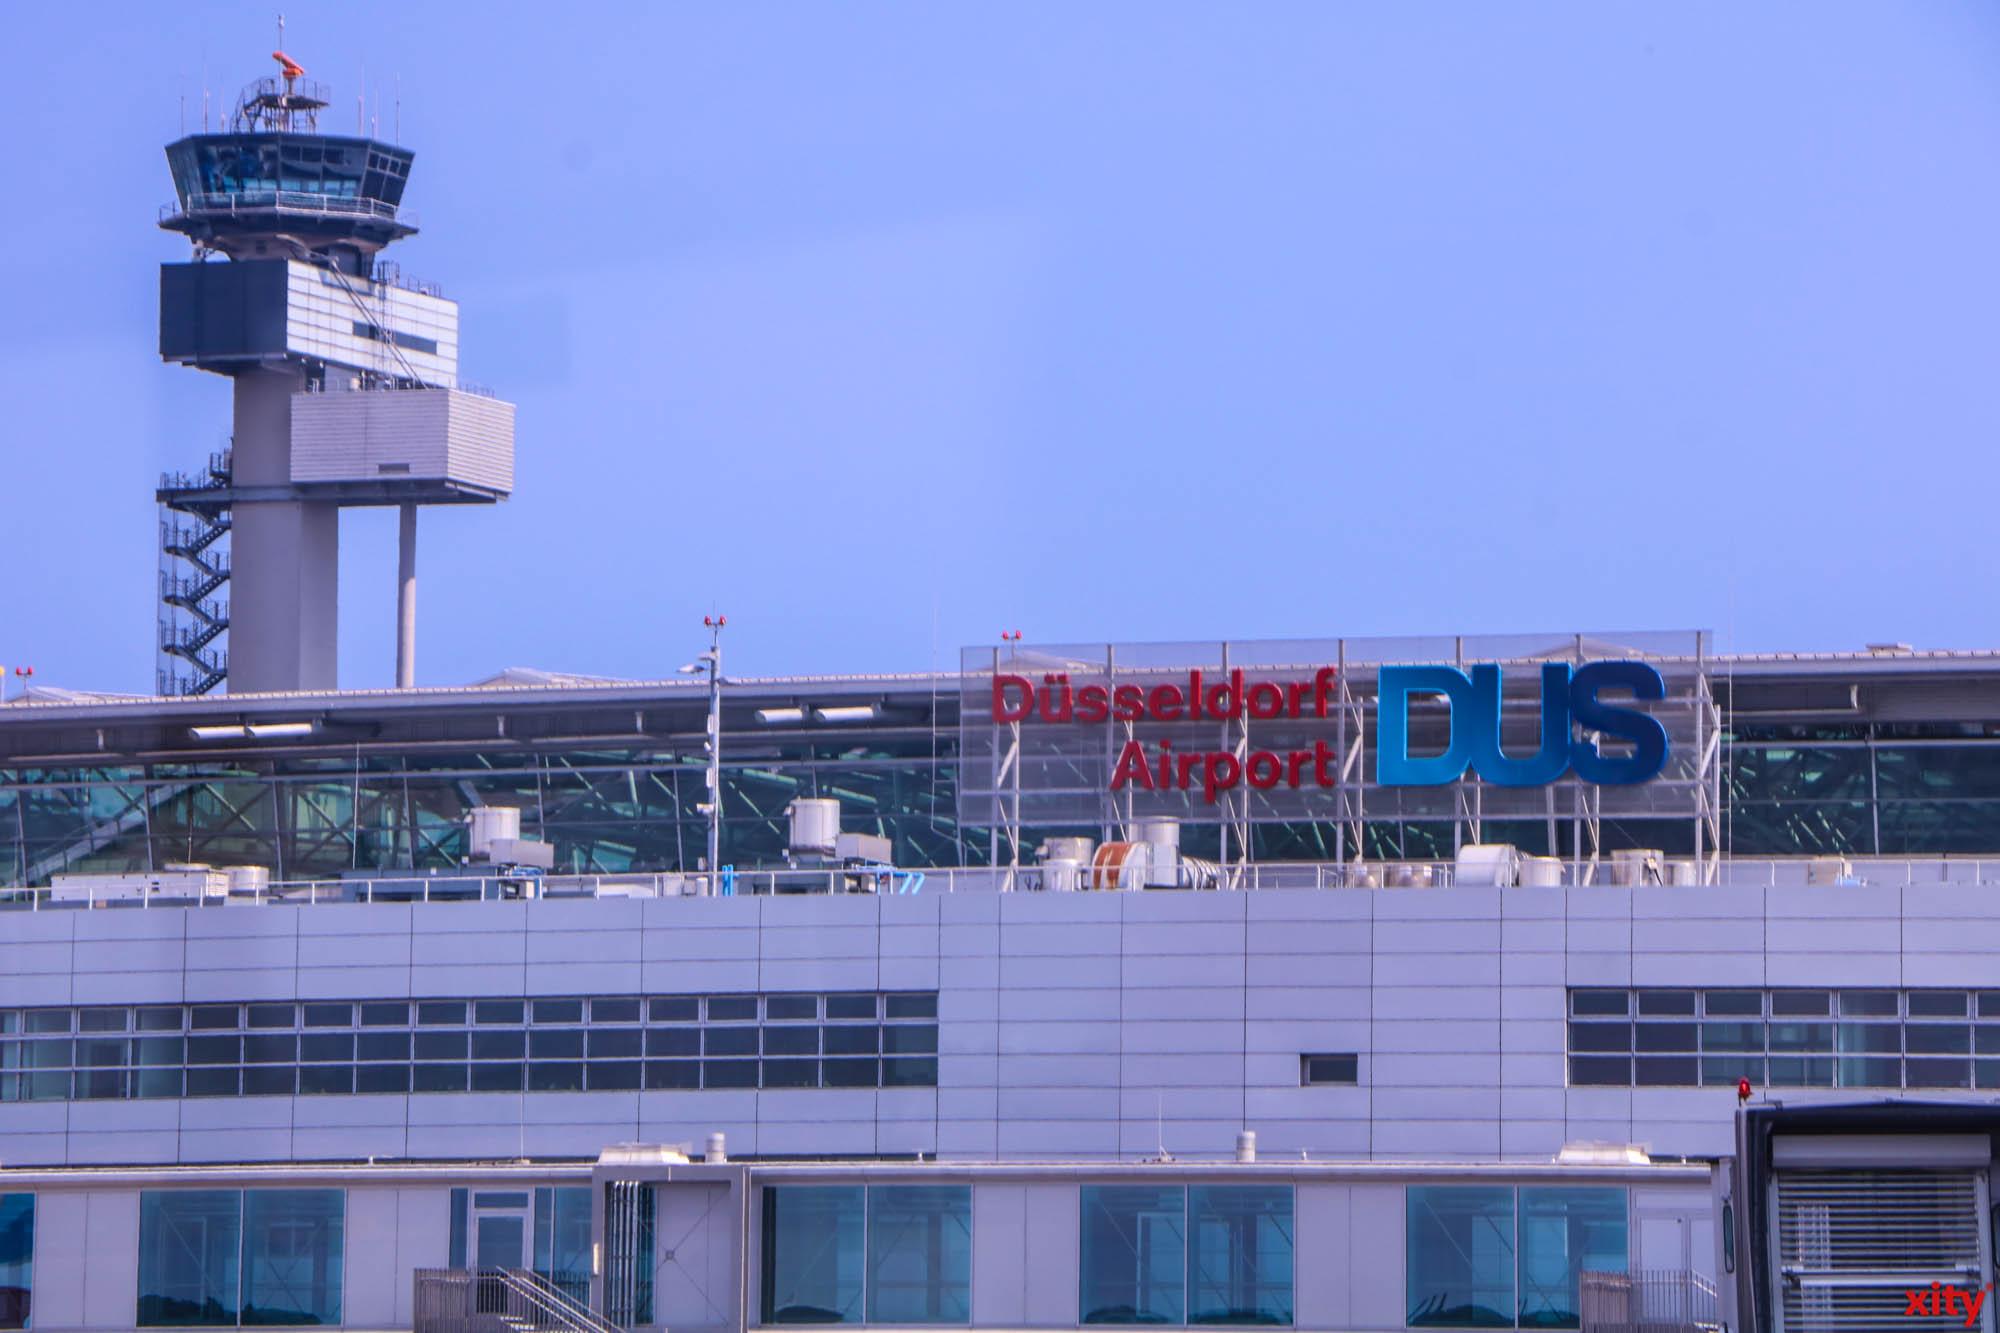 Maßnahmen zur Wiederaufnahme des Luftverkehrs